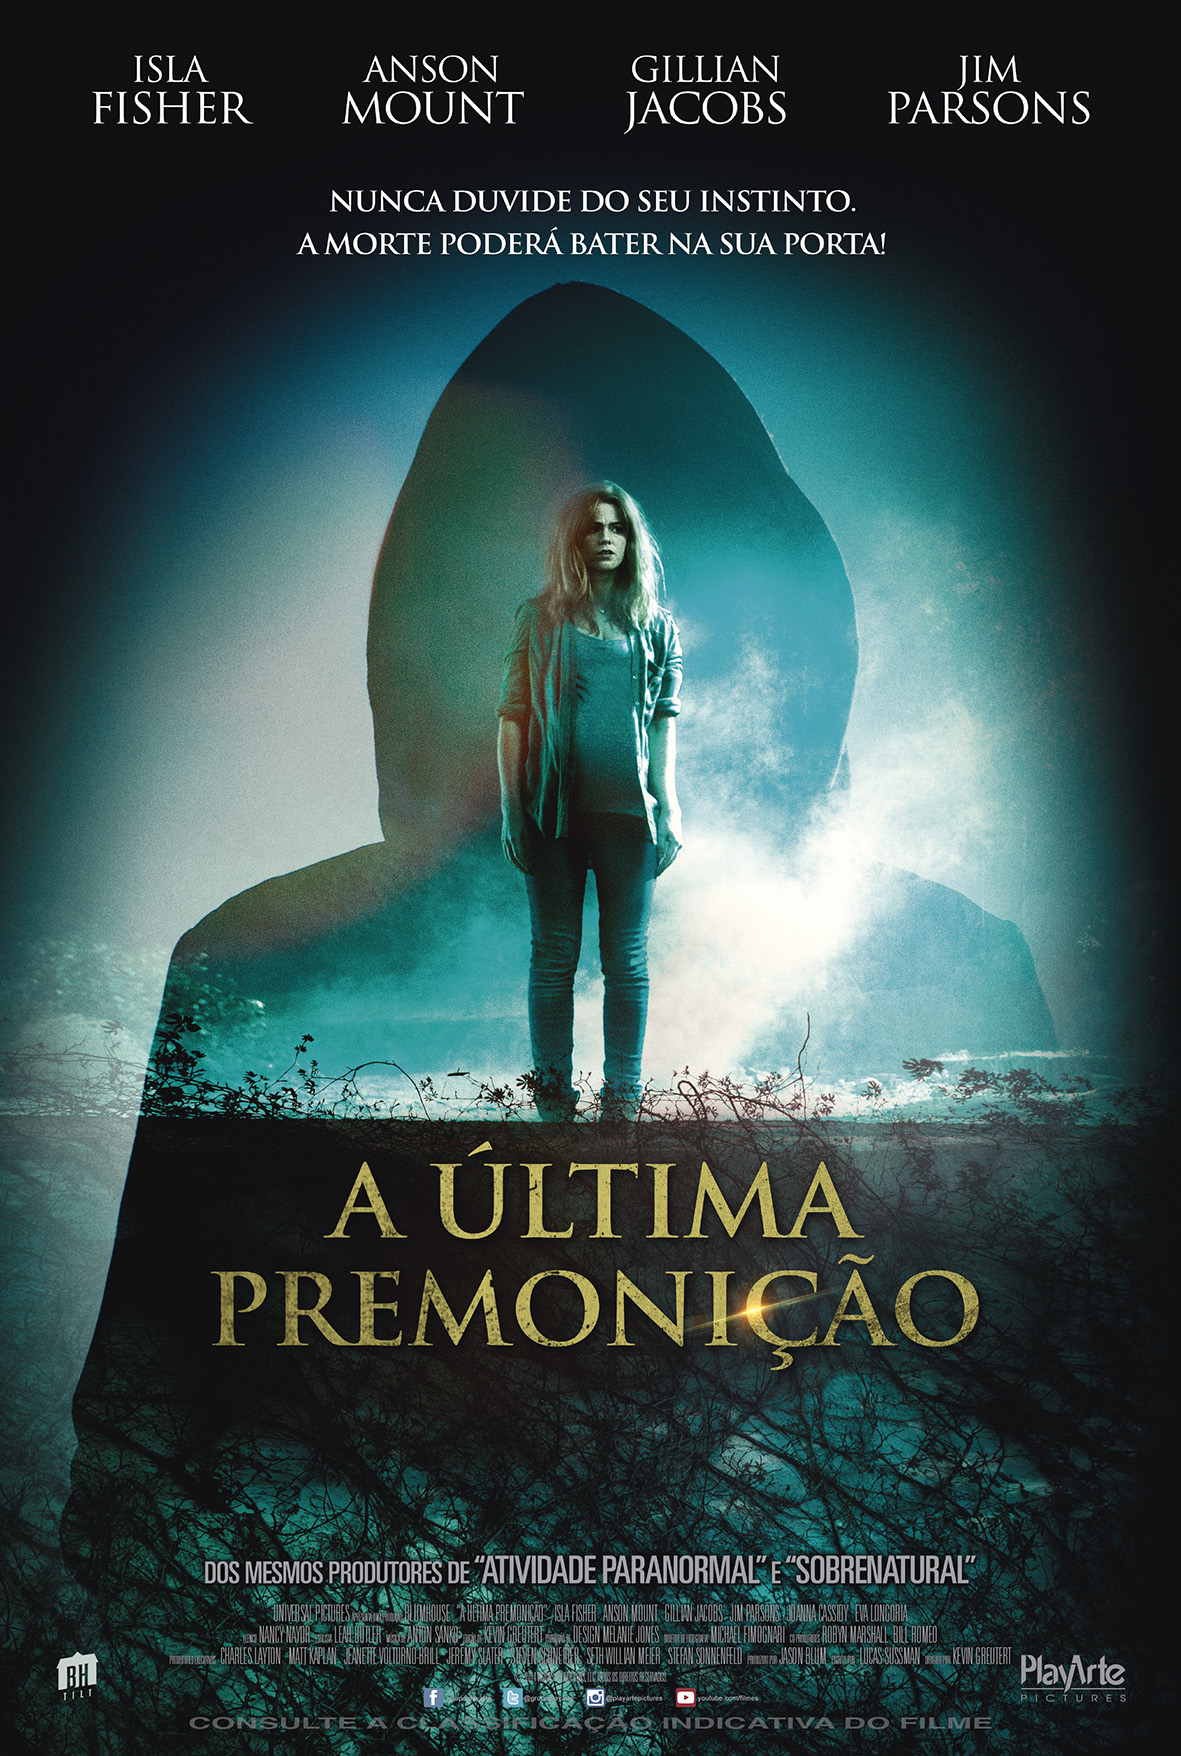 A Ultima Premonicao Filme 2015 Adorocinema